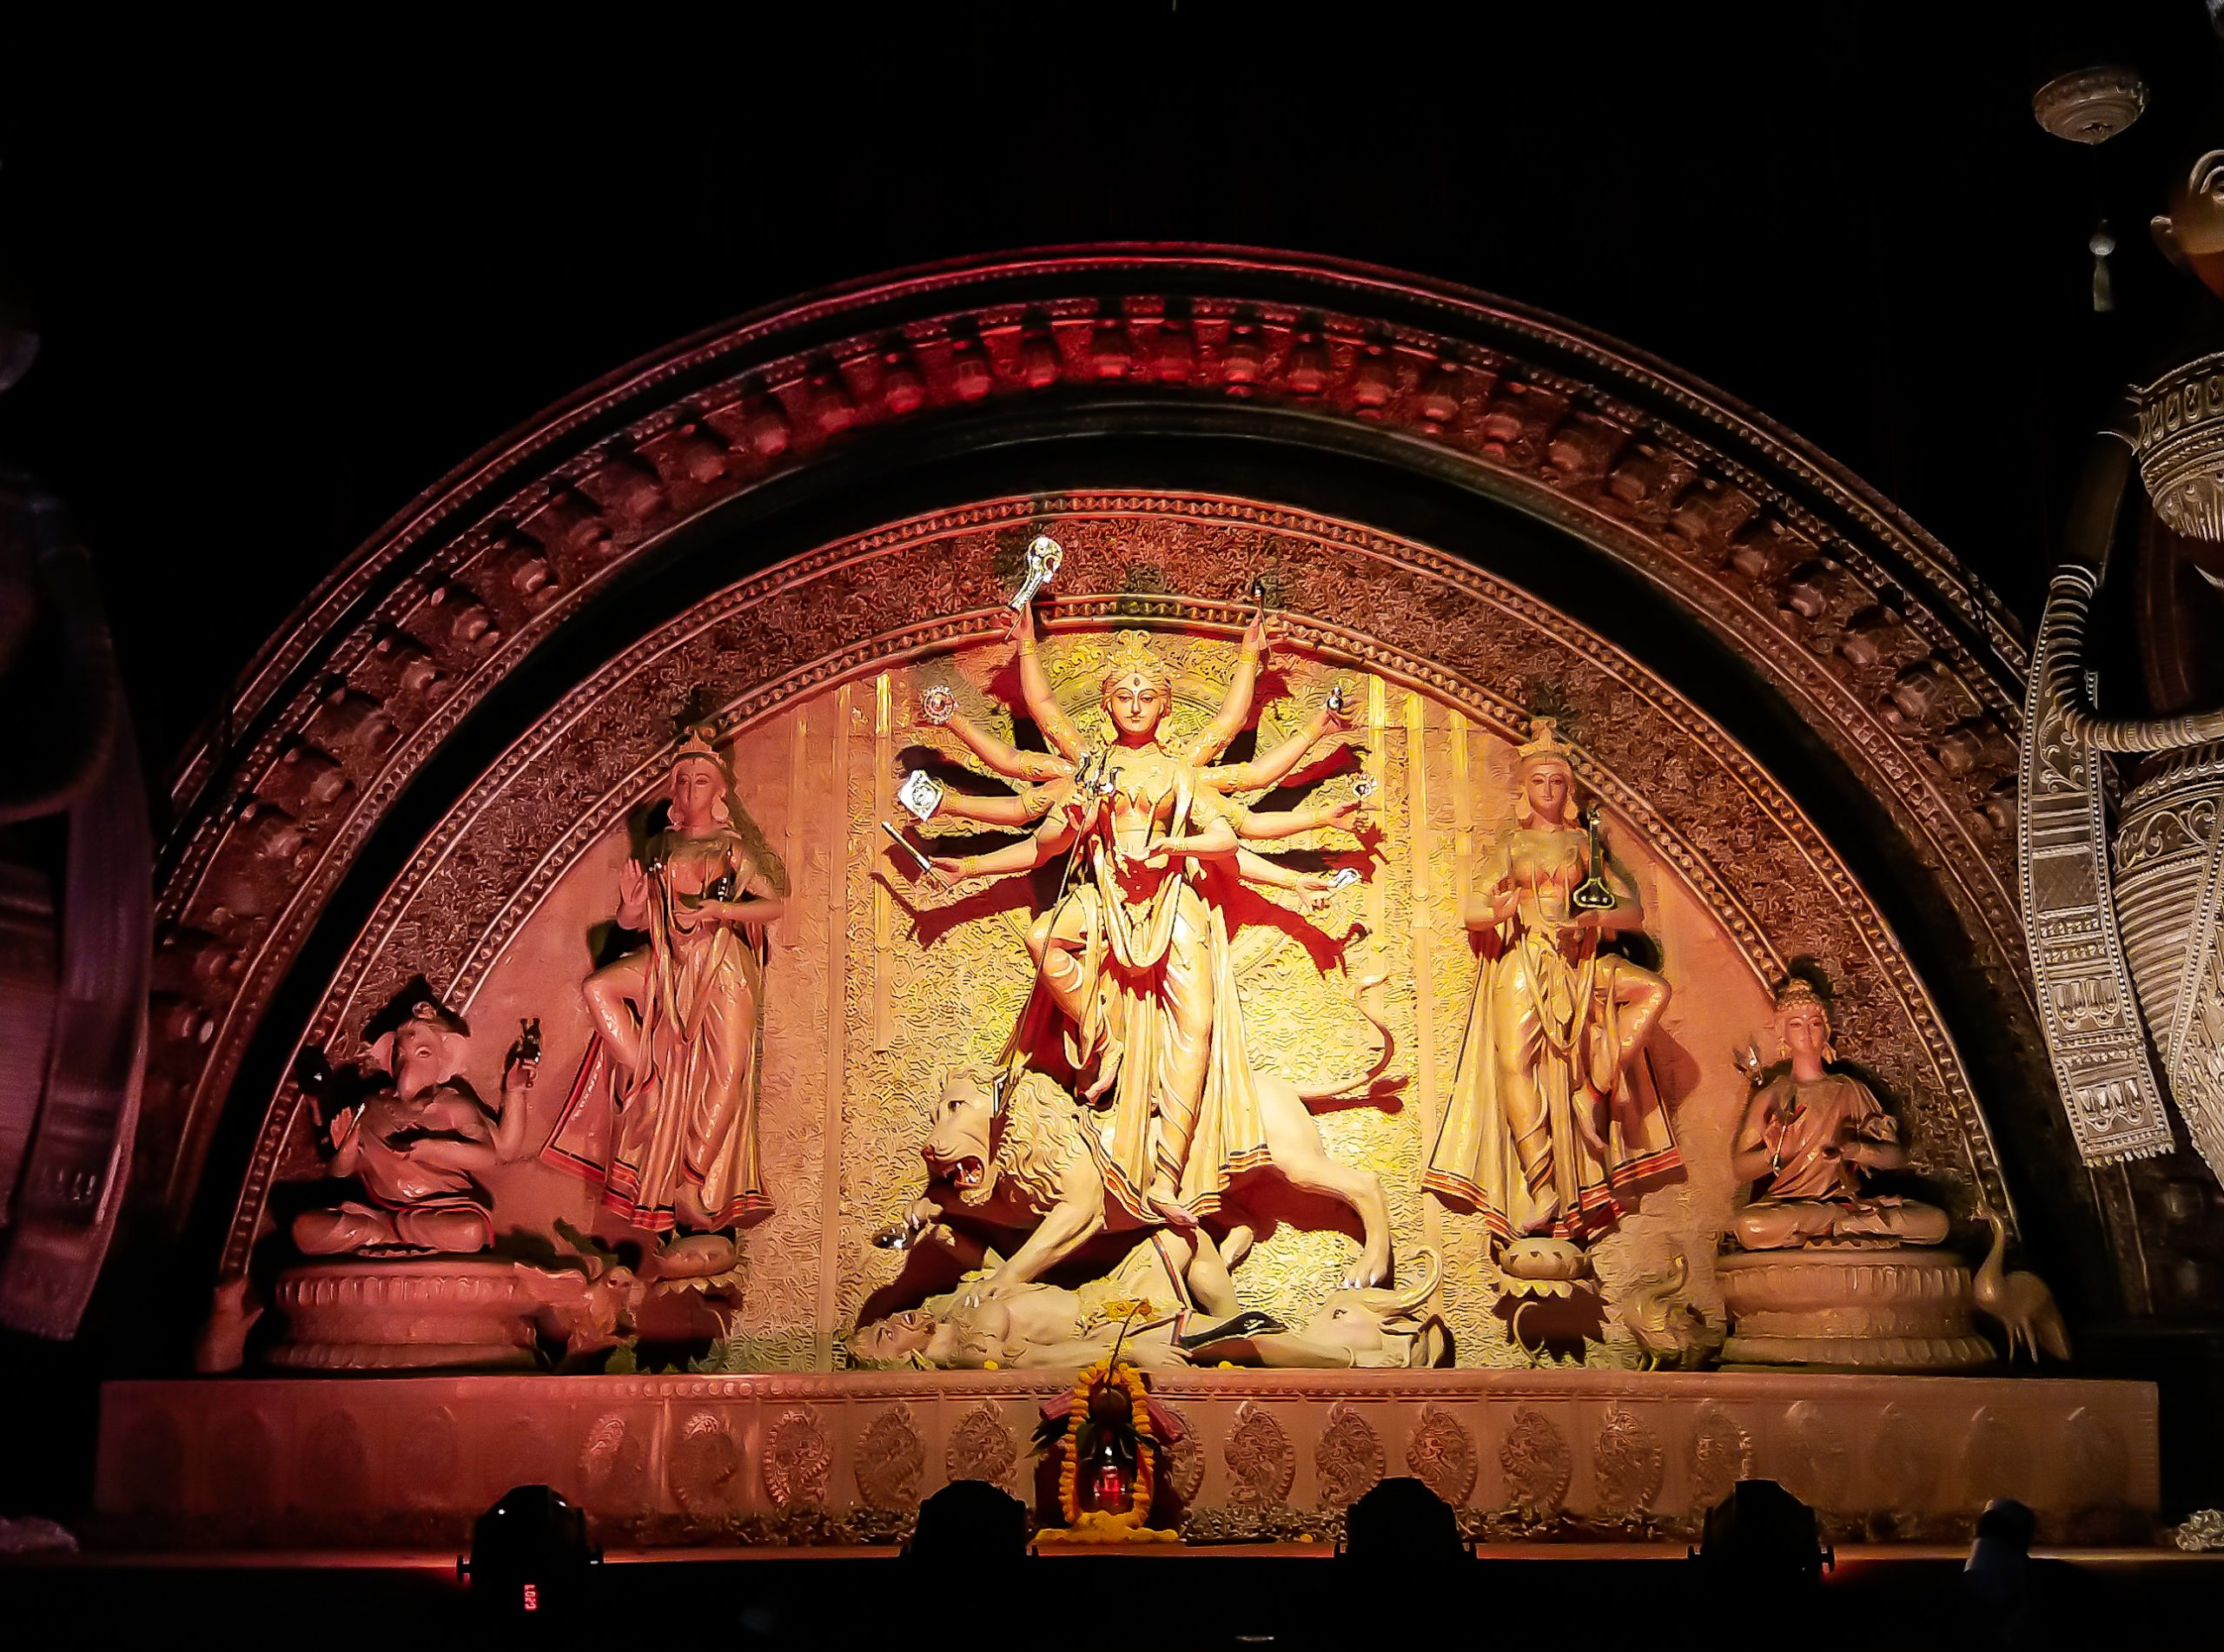 Statues of goddess Durga